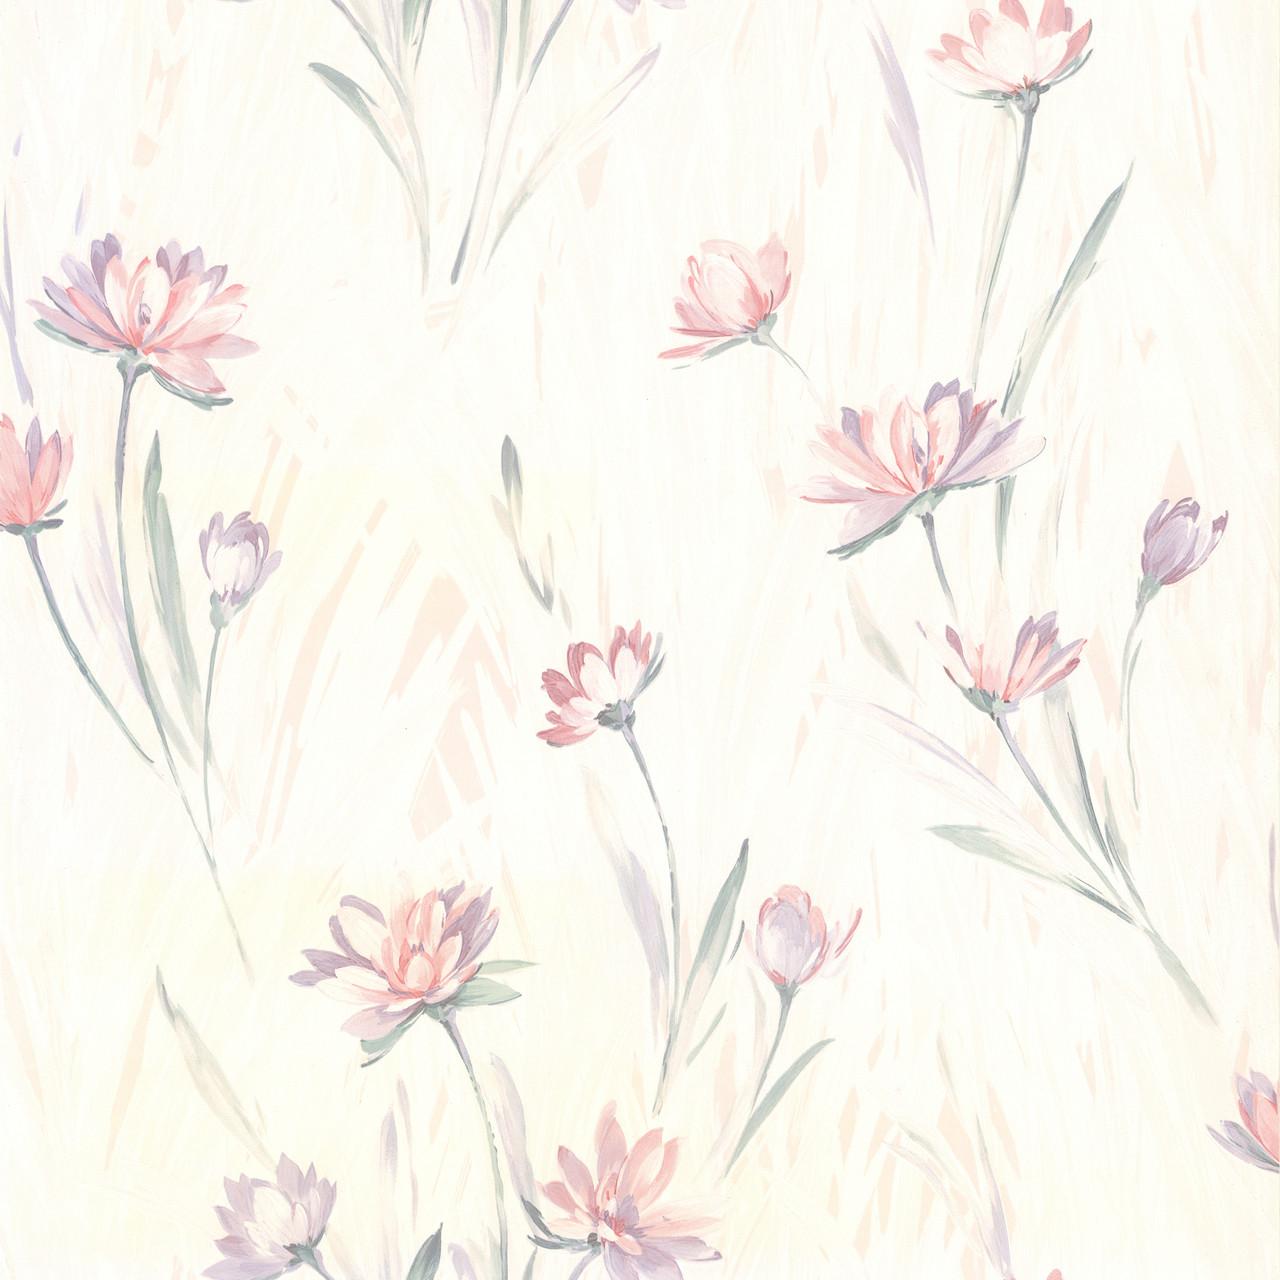 436 37400 Veldt Lavender Chic Floral Wallpaper Indoorwallpaper Com